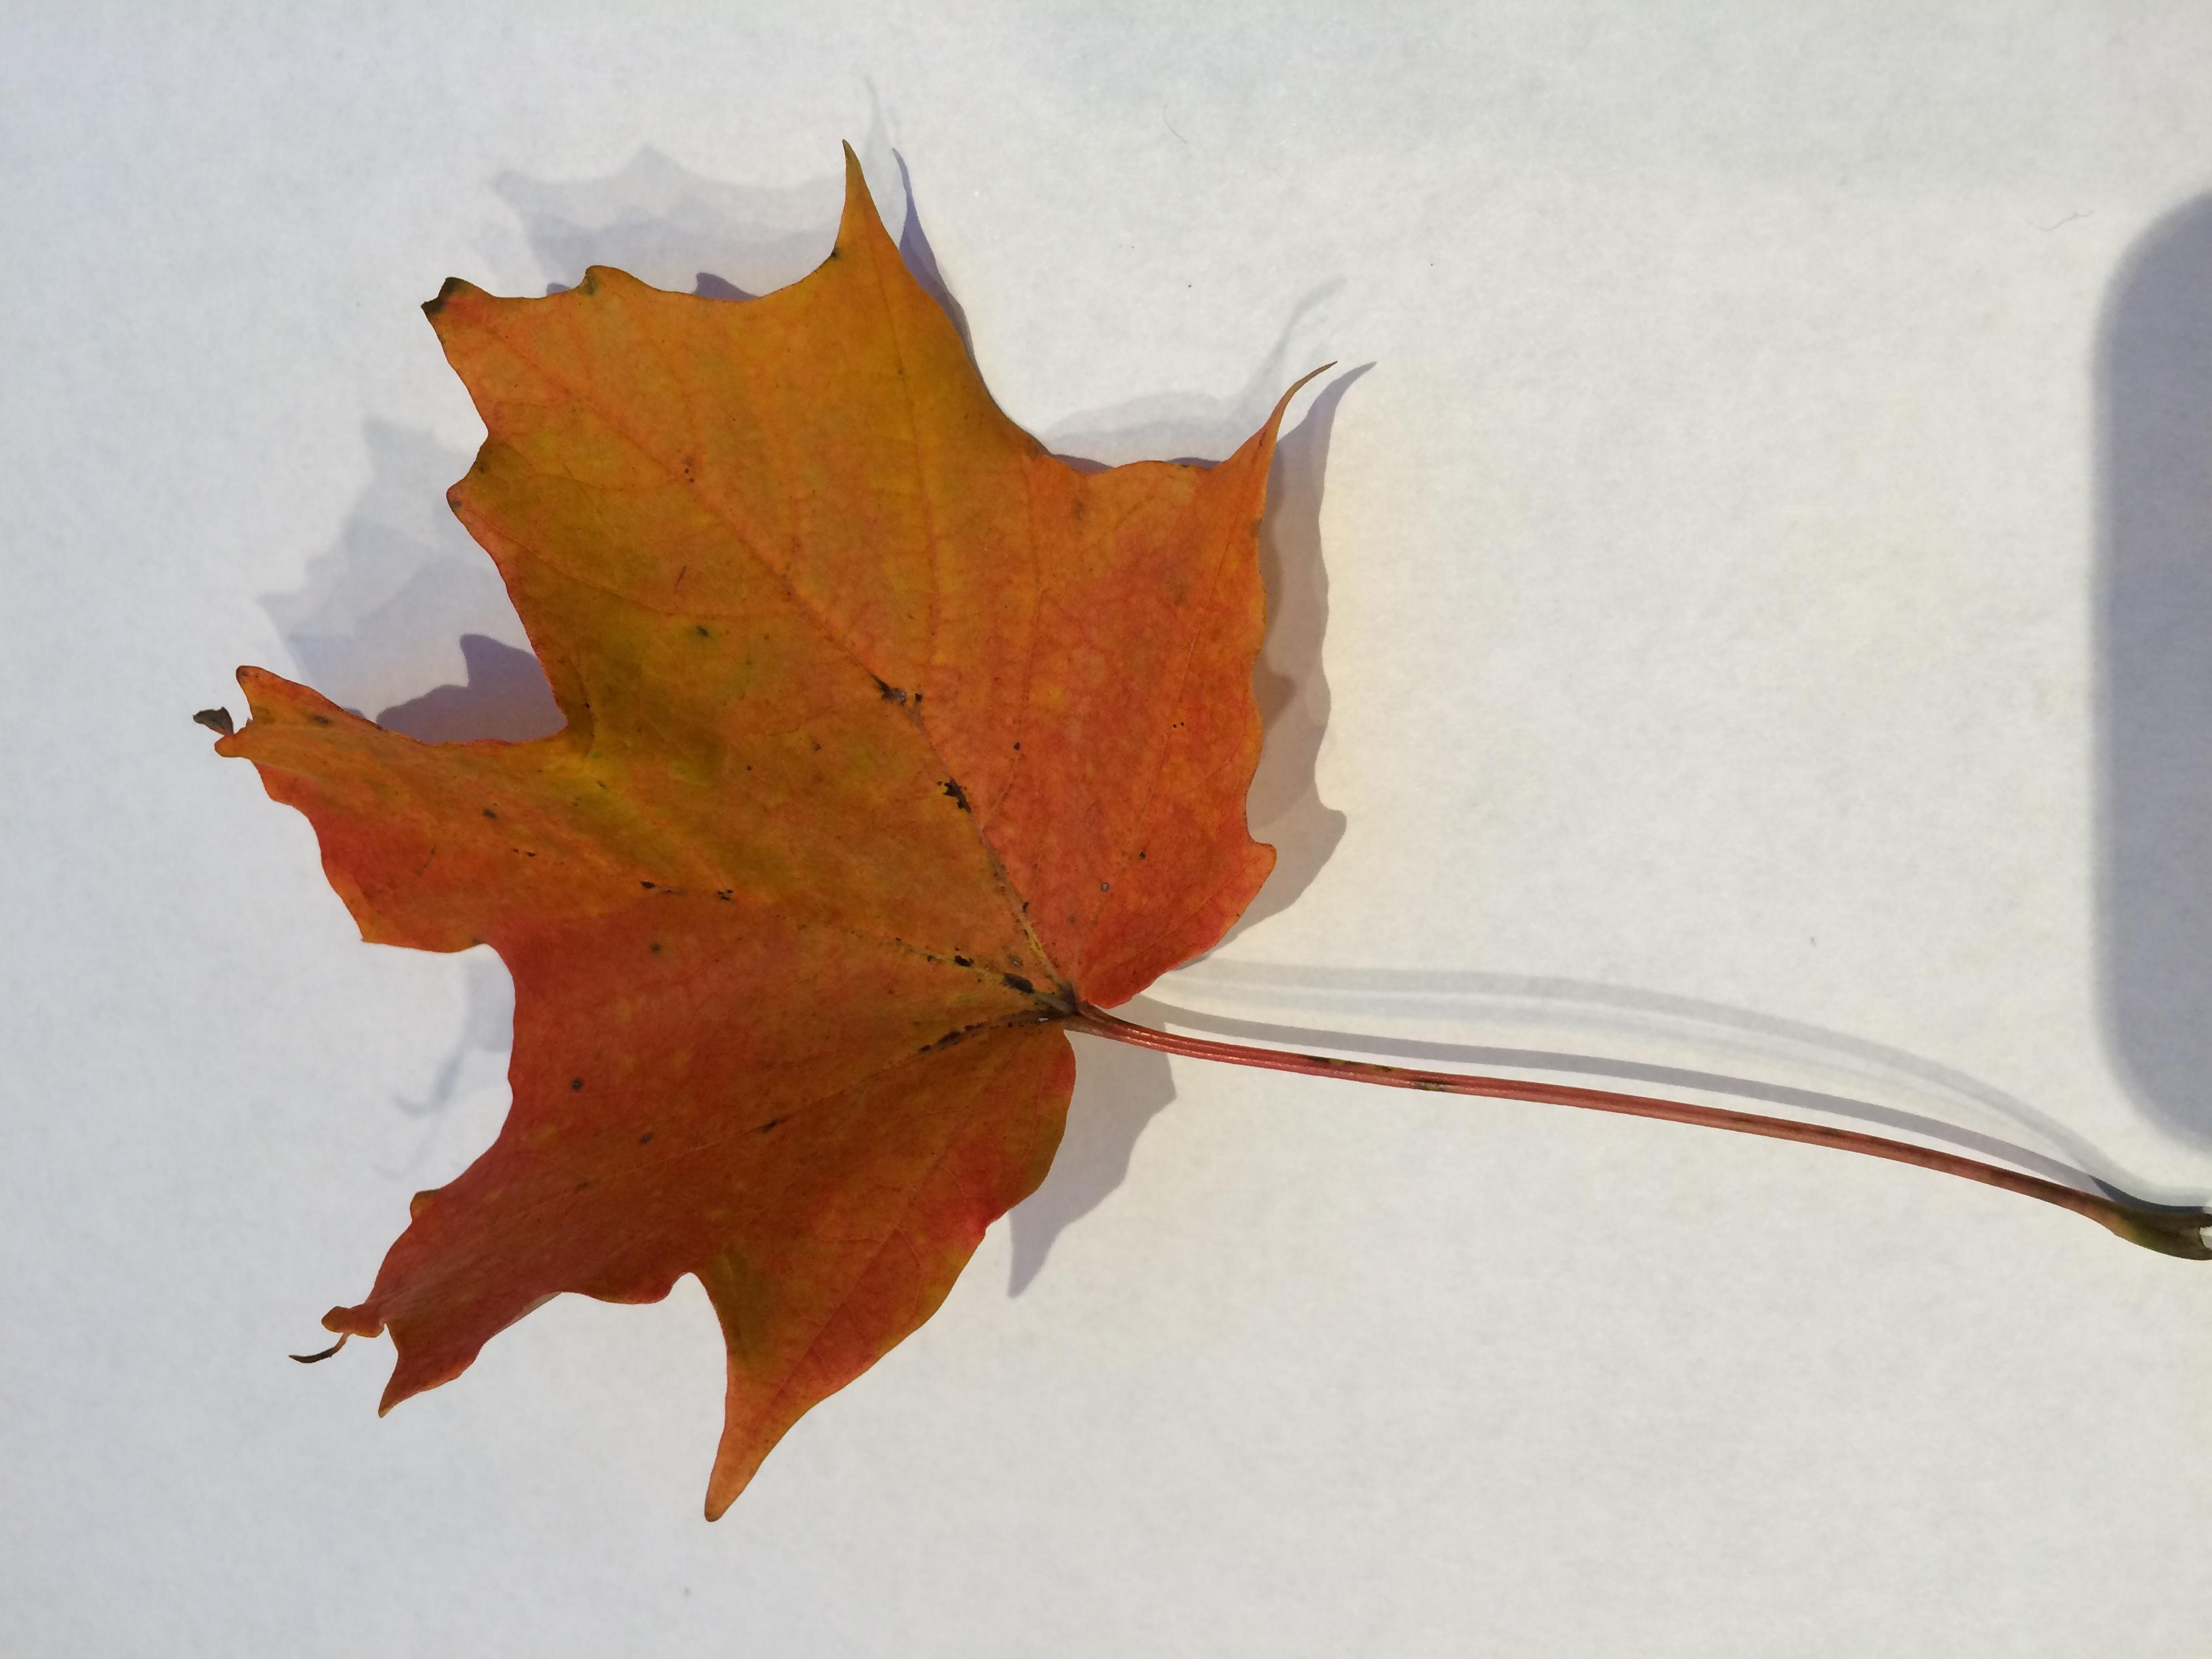 gwl/static/gwl/images/new-leaves/red-4.jpg